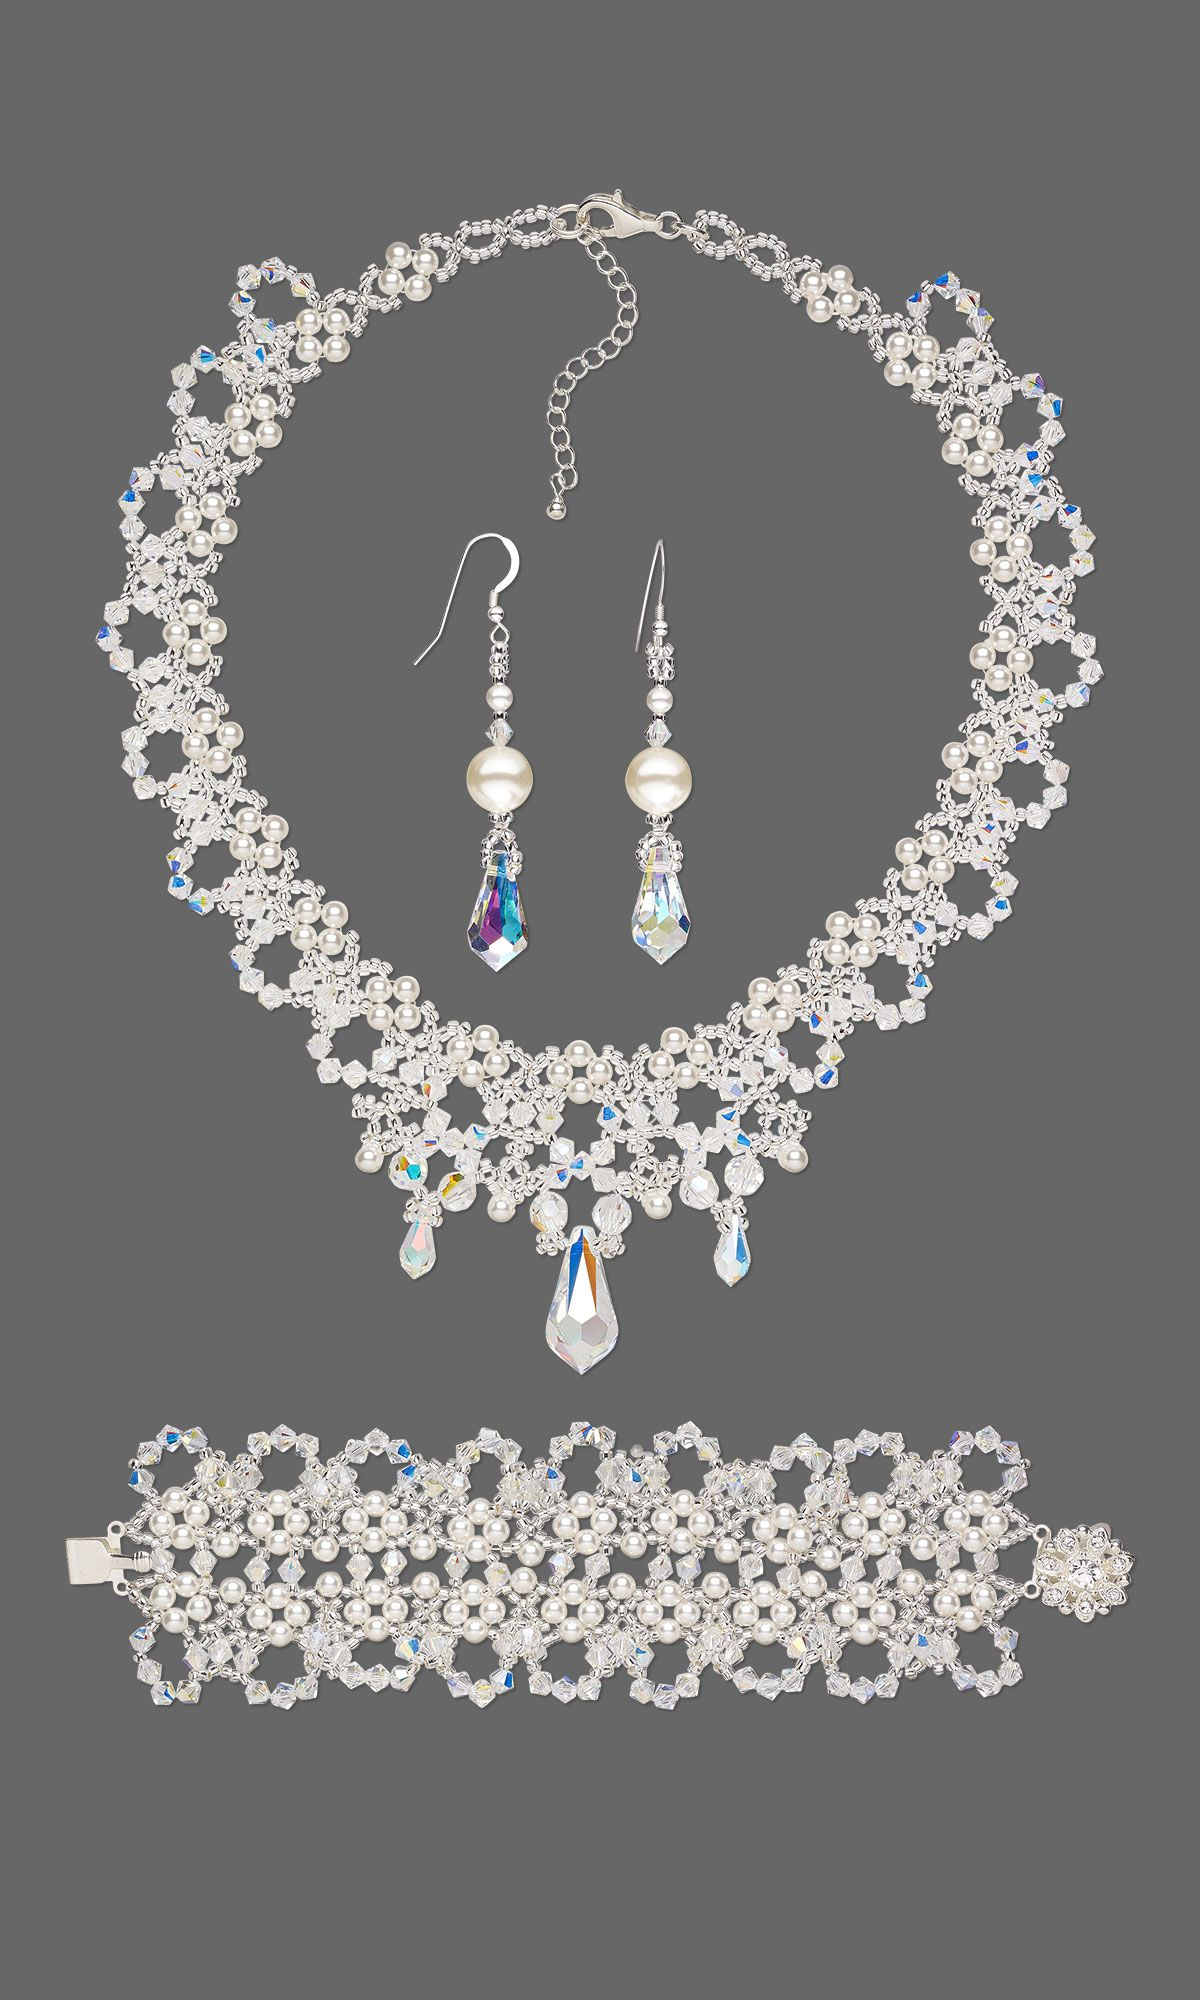 "Fire Mountain Gems and Beads' 2014 Swarovski Bronze Medal Prize Winner (Wedding and Holiday) - design F12Z ""Down the Aisle"" by Florewela Dela Cruz Cornelis #diyjewelrymaking #beadingcontest #jewelrymakingcontest"